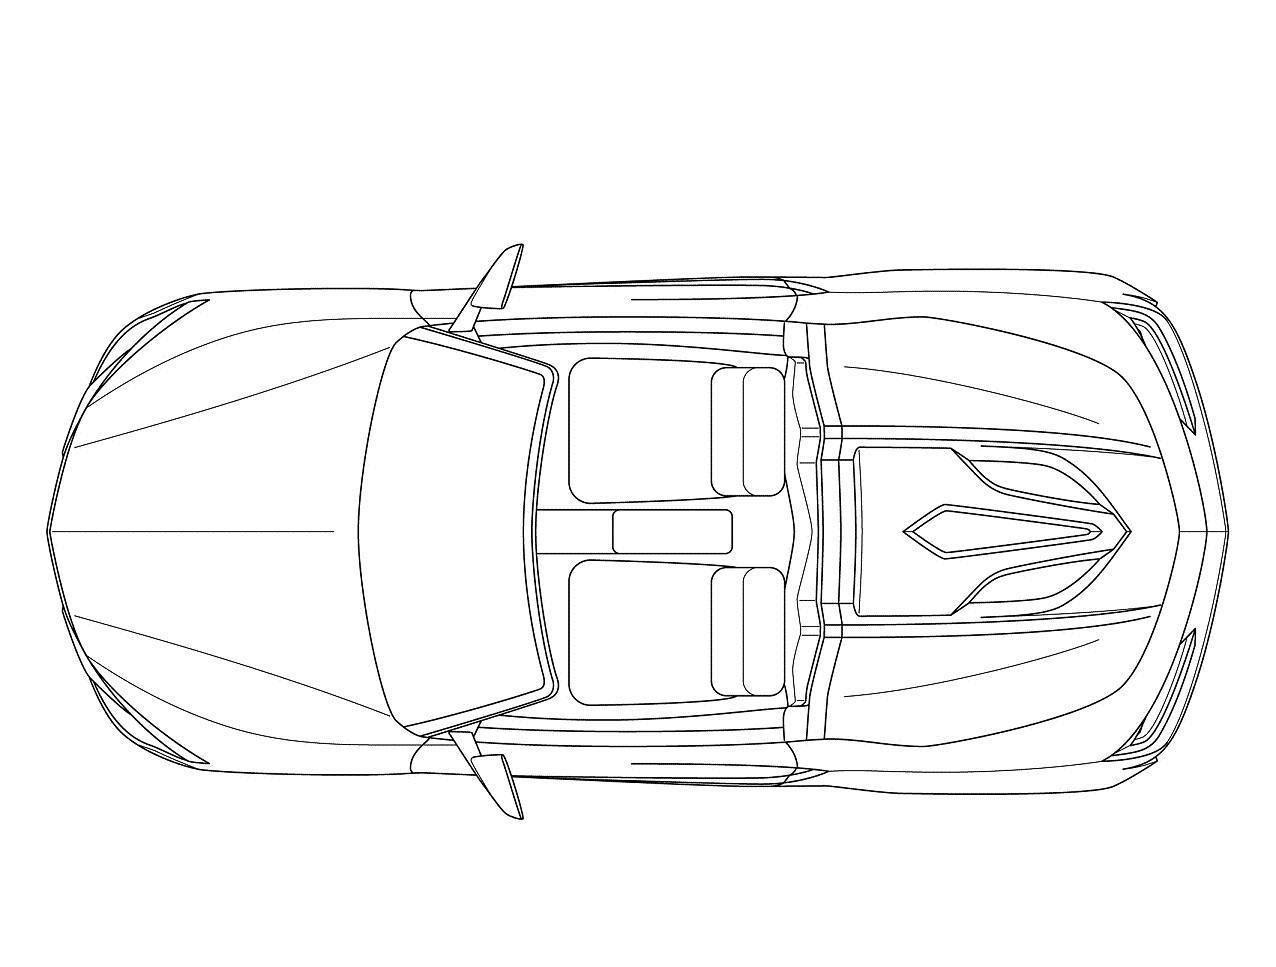 2014 acura nsx car latest car concept latest cars bikes Honda Civic LX Coupe 2014 acura nsx roadster sketch